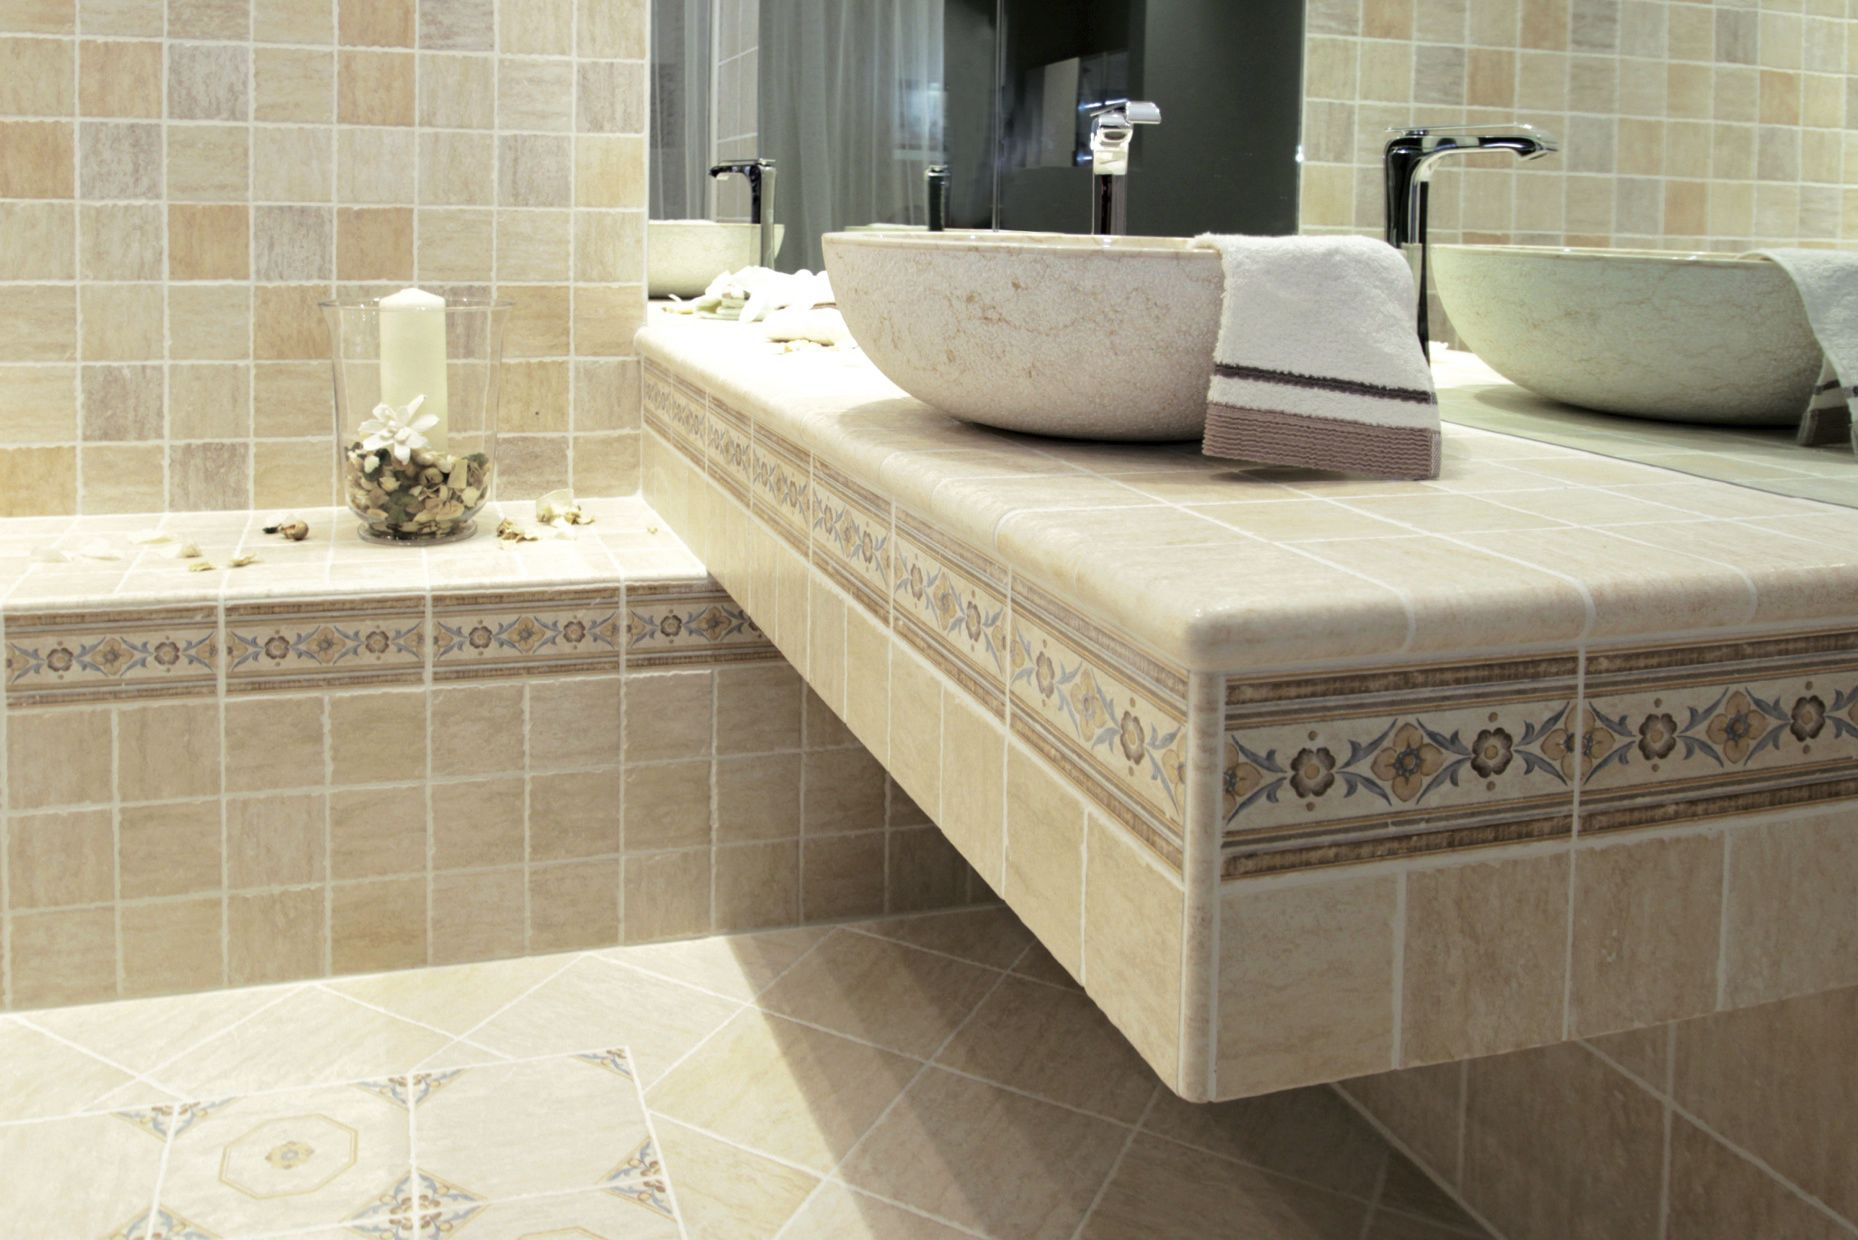 Bathroom tile / floor / wall / ceramic - GIOIELLI : FLORENTIA ...